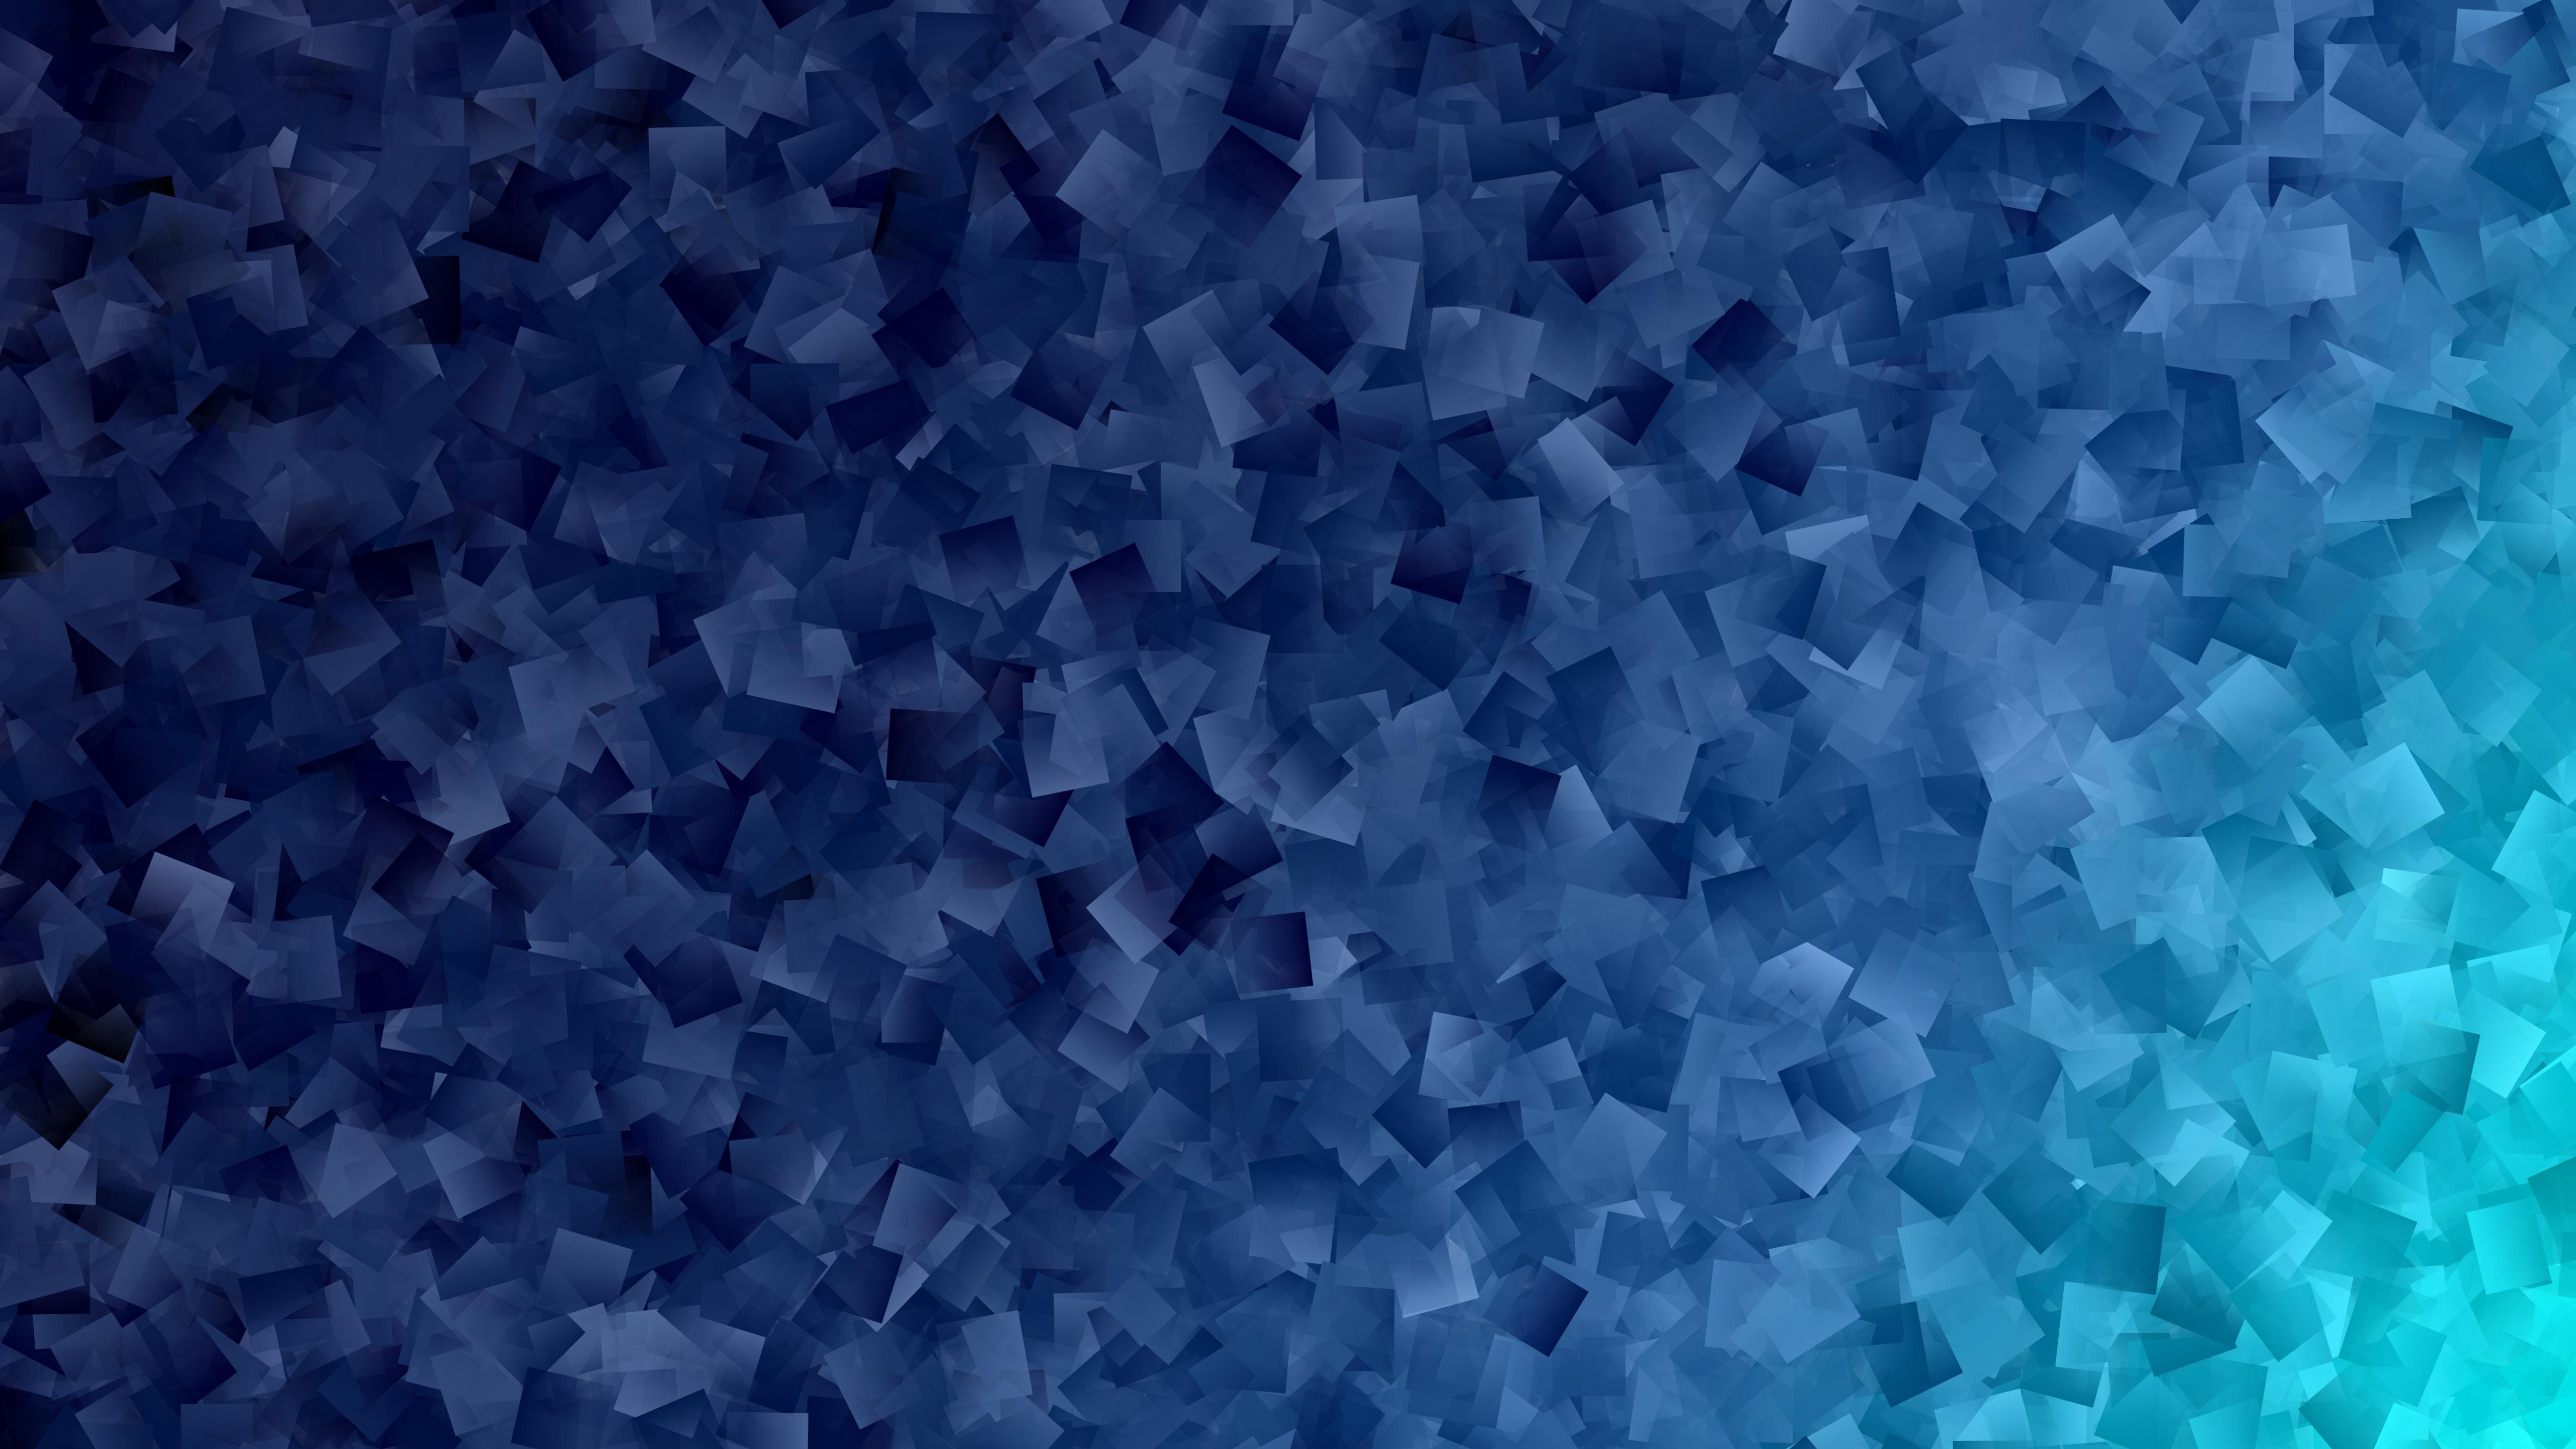 Abstract, blue patterns, design, 5120x2880, 5k wallpaper